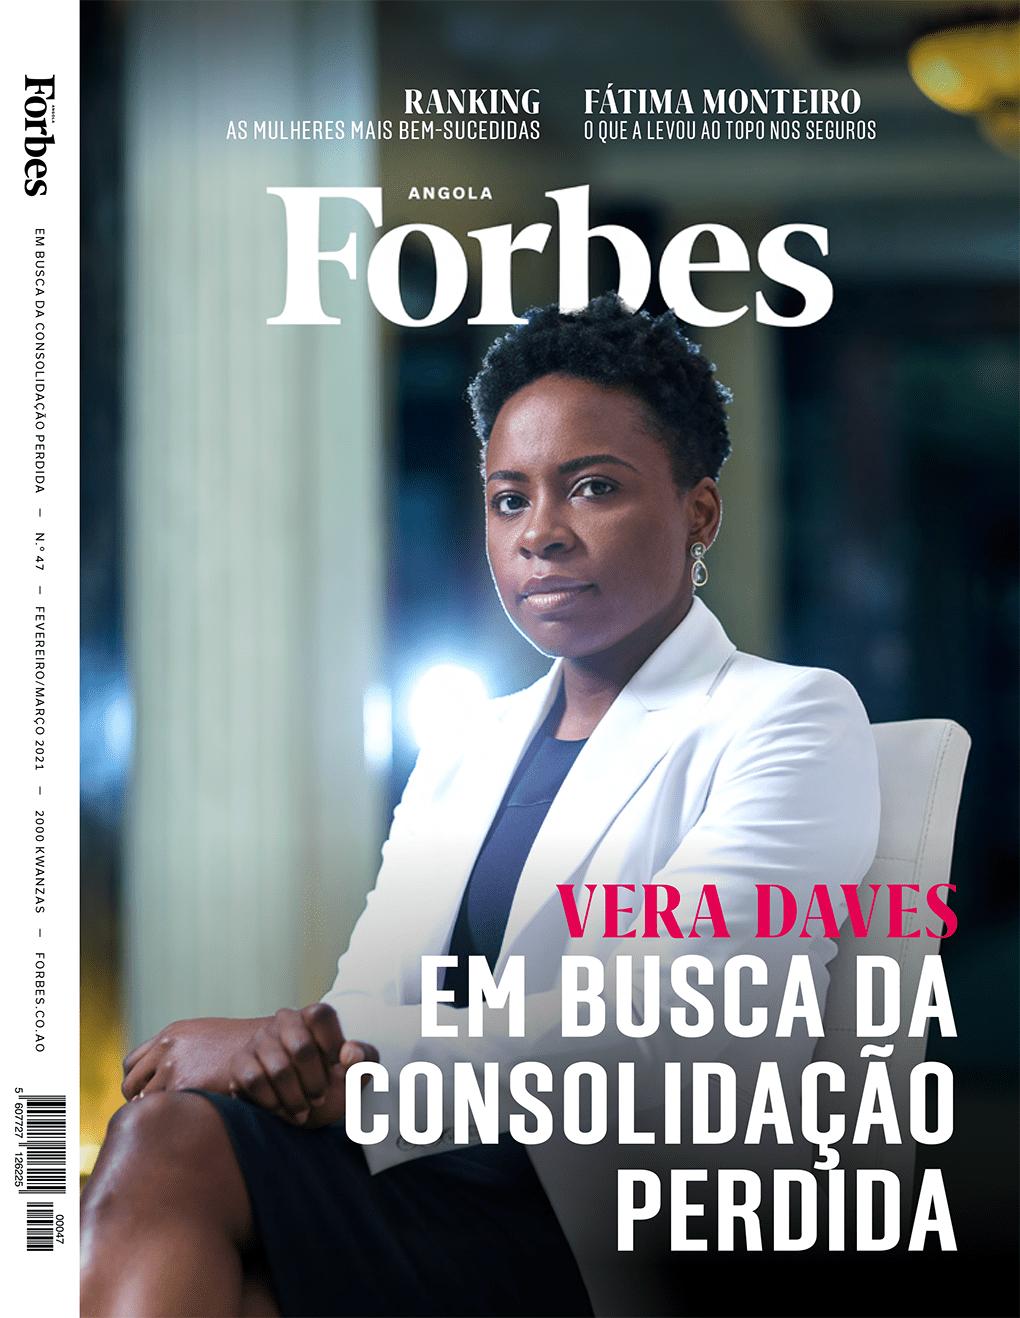 Revista_Forbes-Ao_47-cover-min